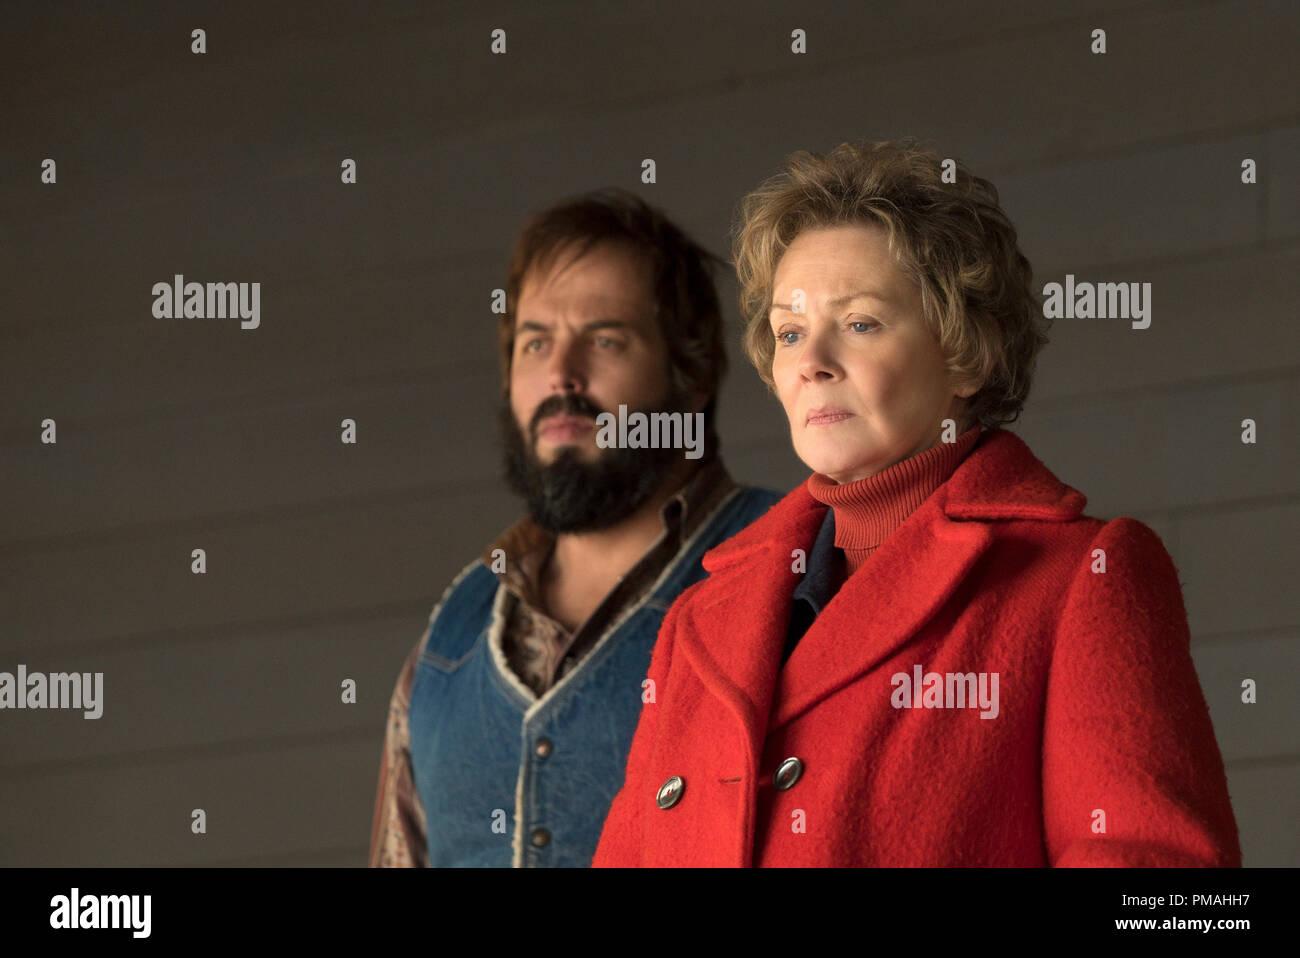 FARGO -- ÒThe Myth of SisyphusÓ -- Episode 203 (Airs October 26, 10:00 pm e/p) Pictured: (l-r) Angus Sampson as Bear Gerhardt, Jean Smart as Floyd Gerhardt. - Stock Image